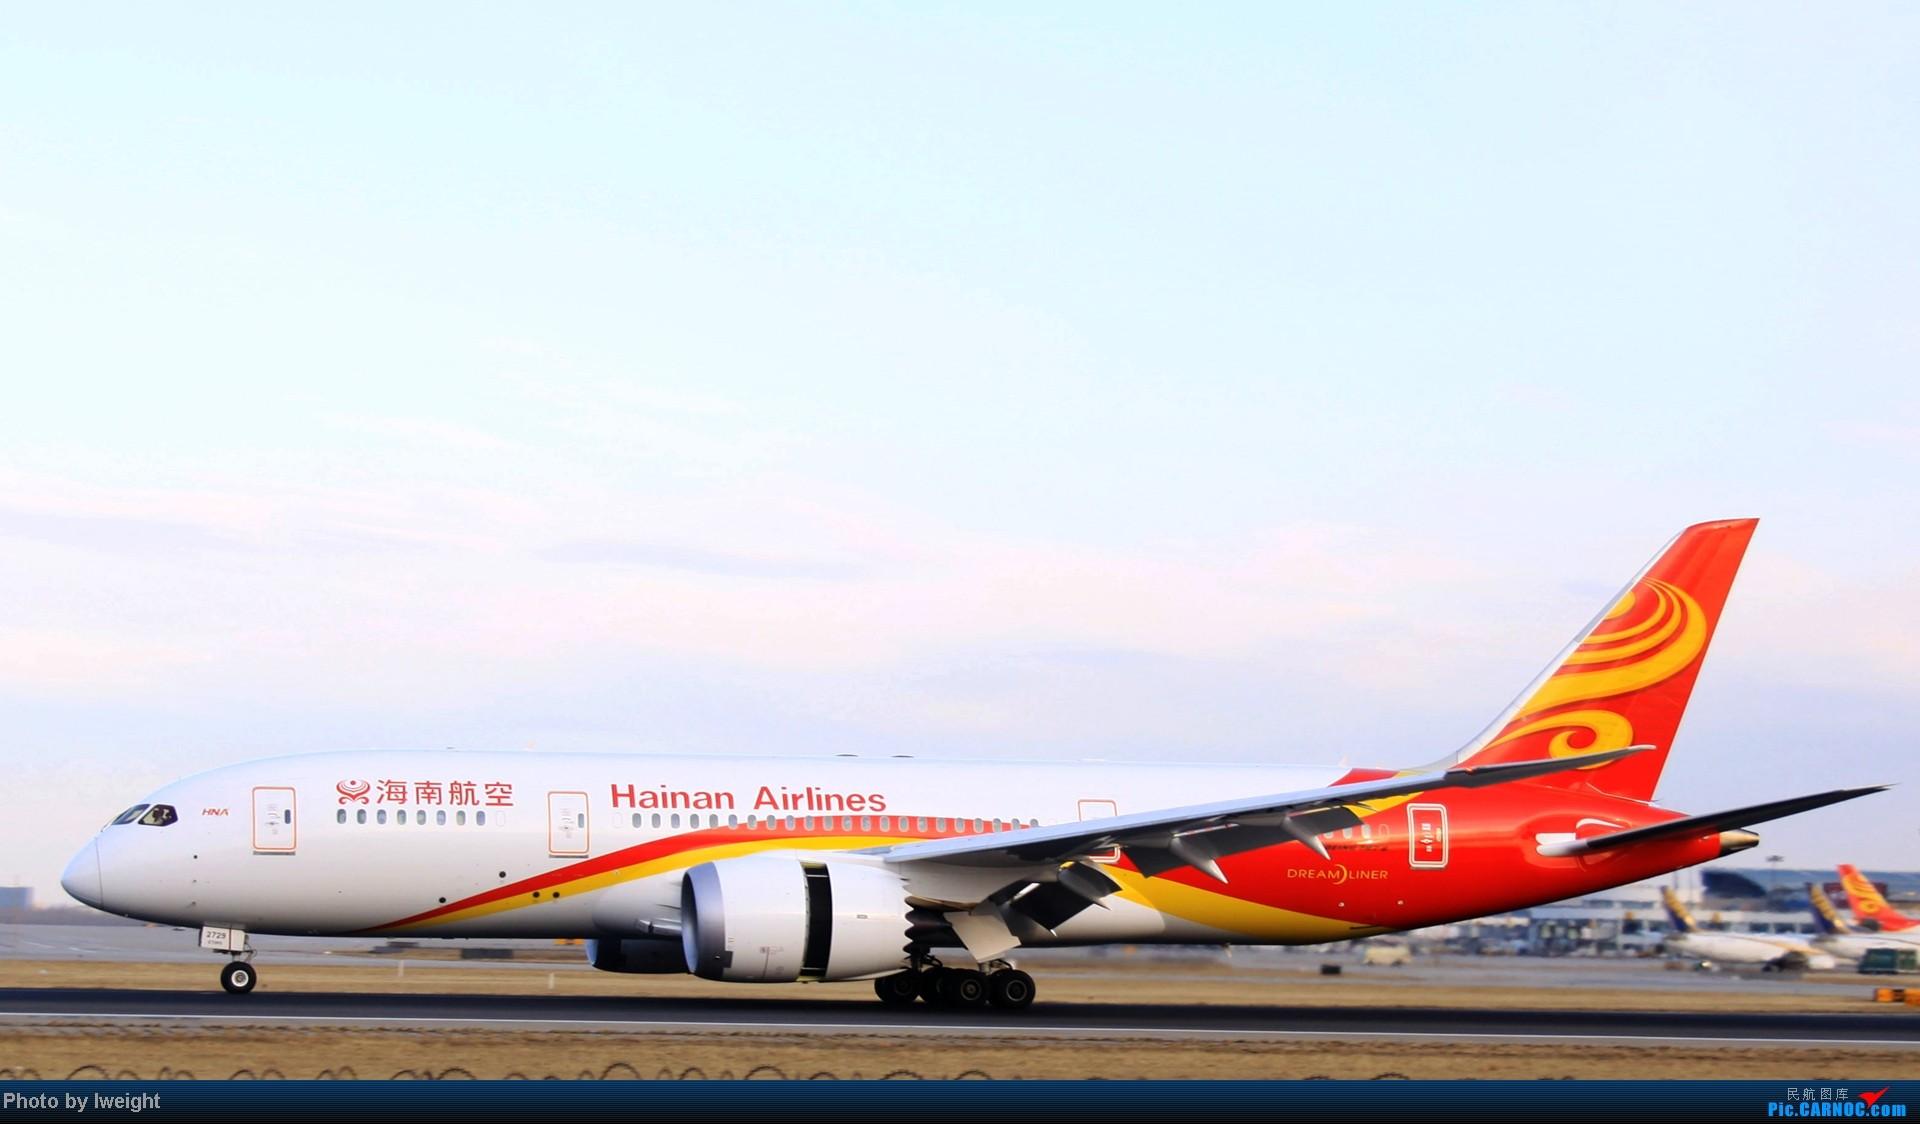 Re:[原创]今天下午瞎拍两个小时的杂图 BOEING 787-8 B-2729 中国北京首都机场